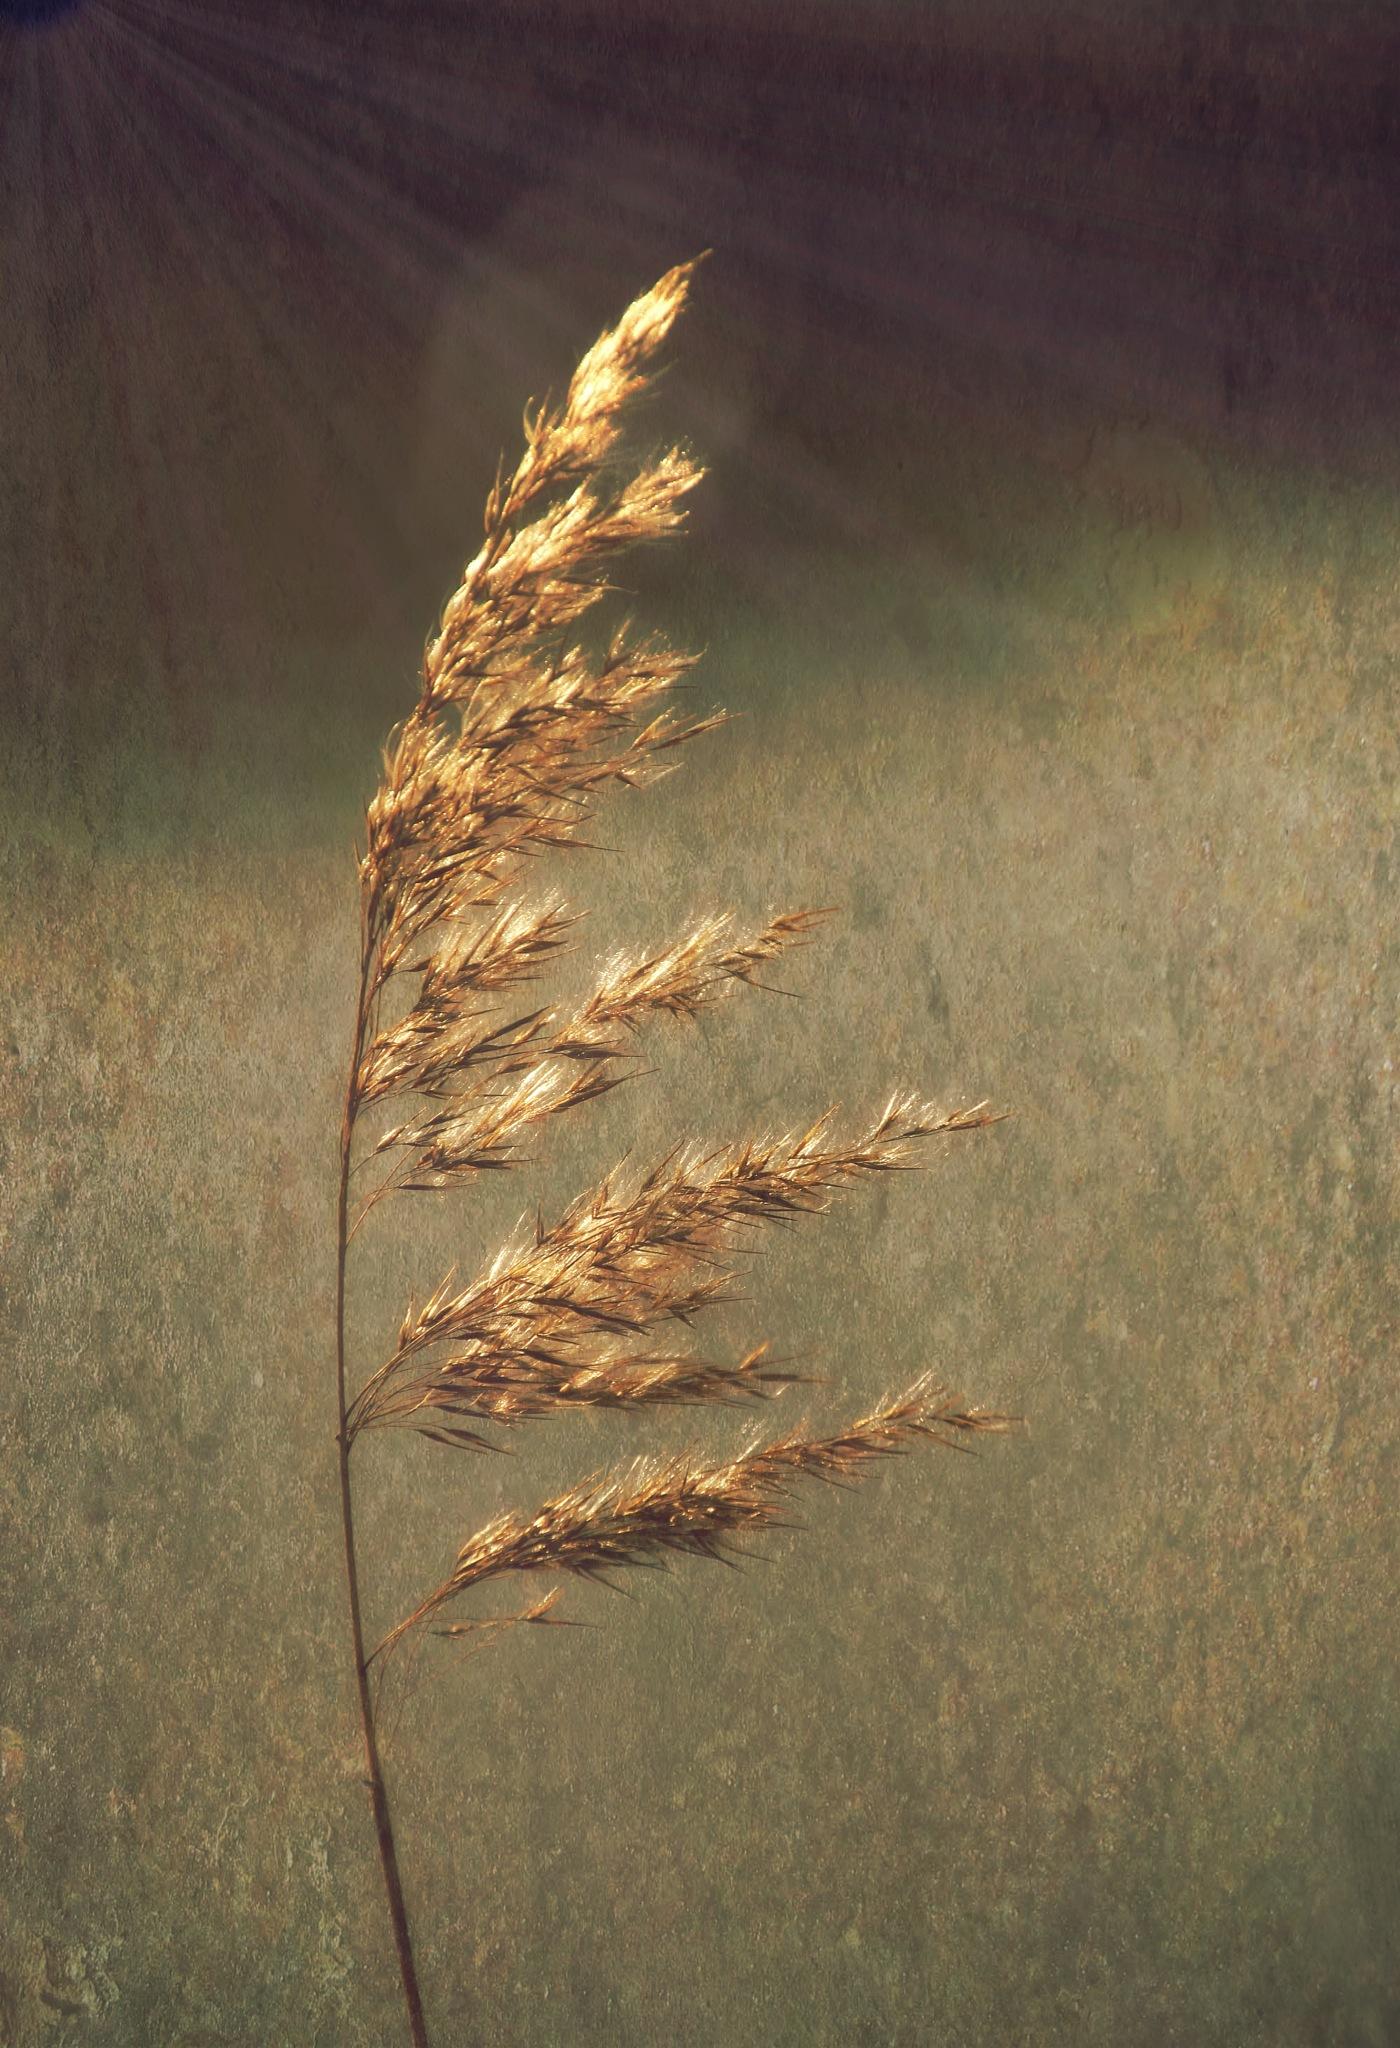 Gold by annamaria.jacobsgalluzzi